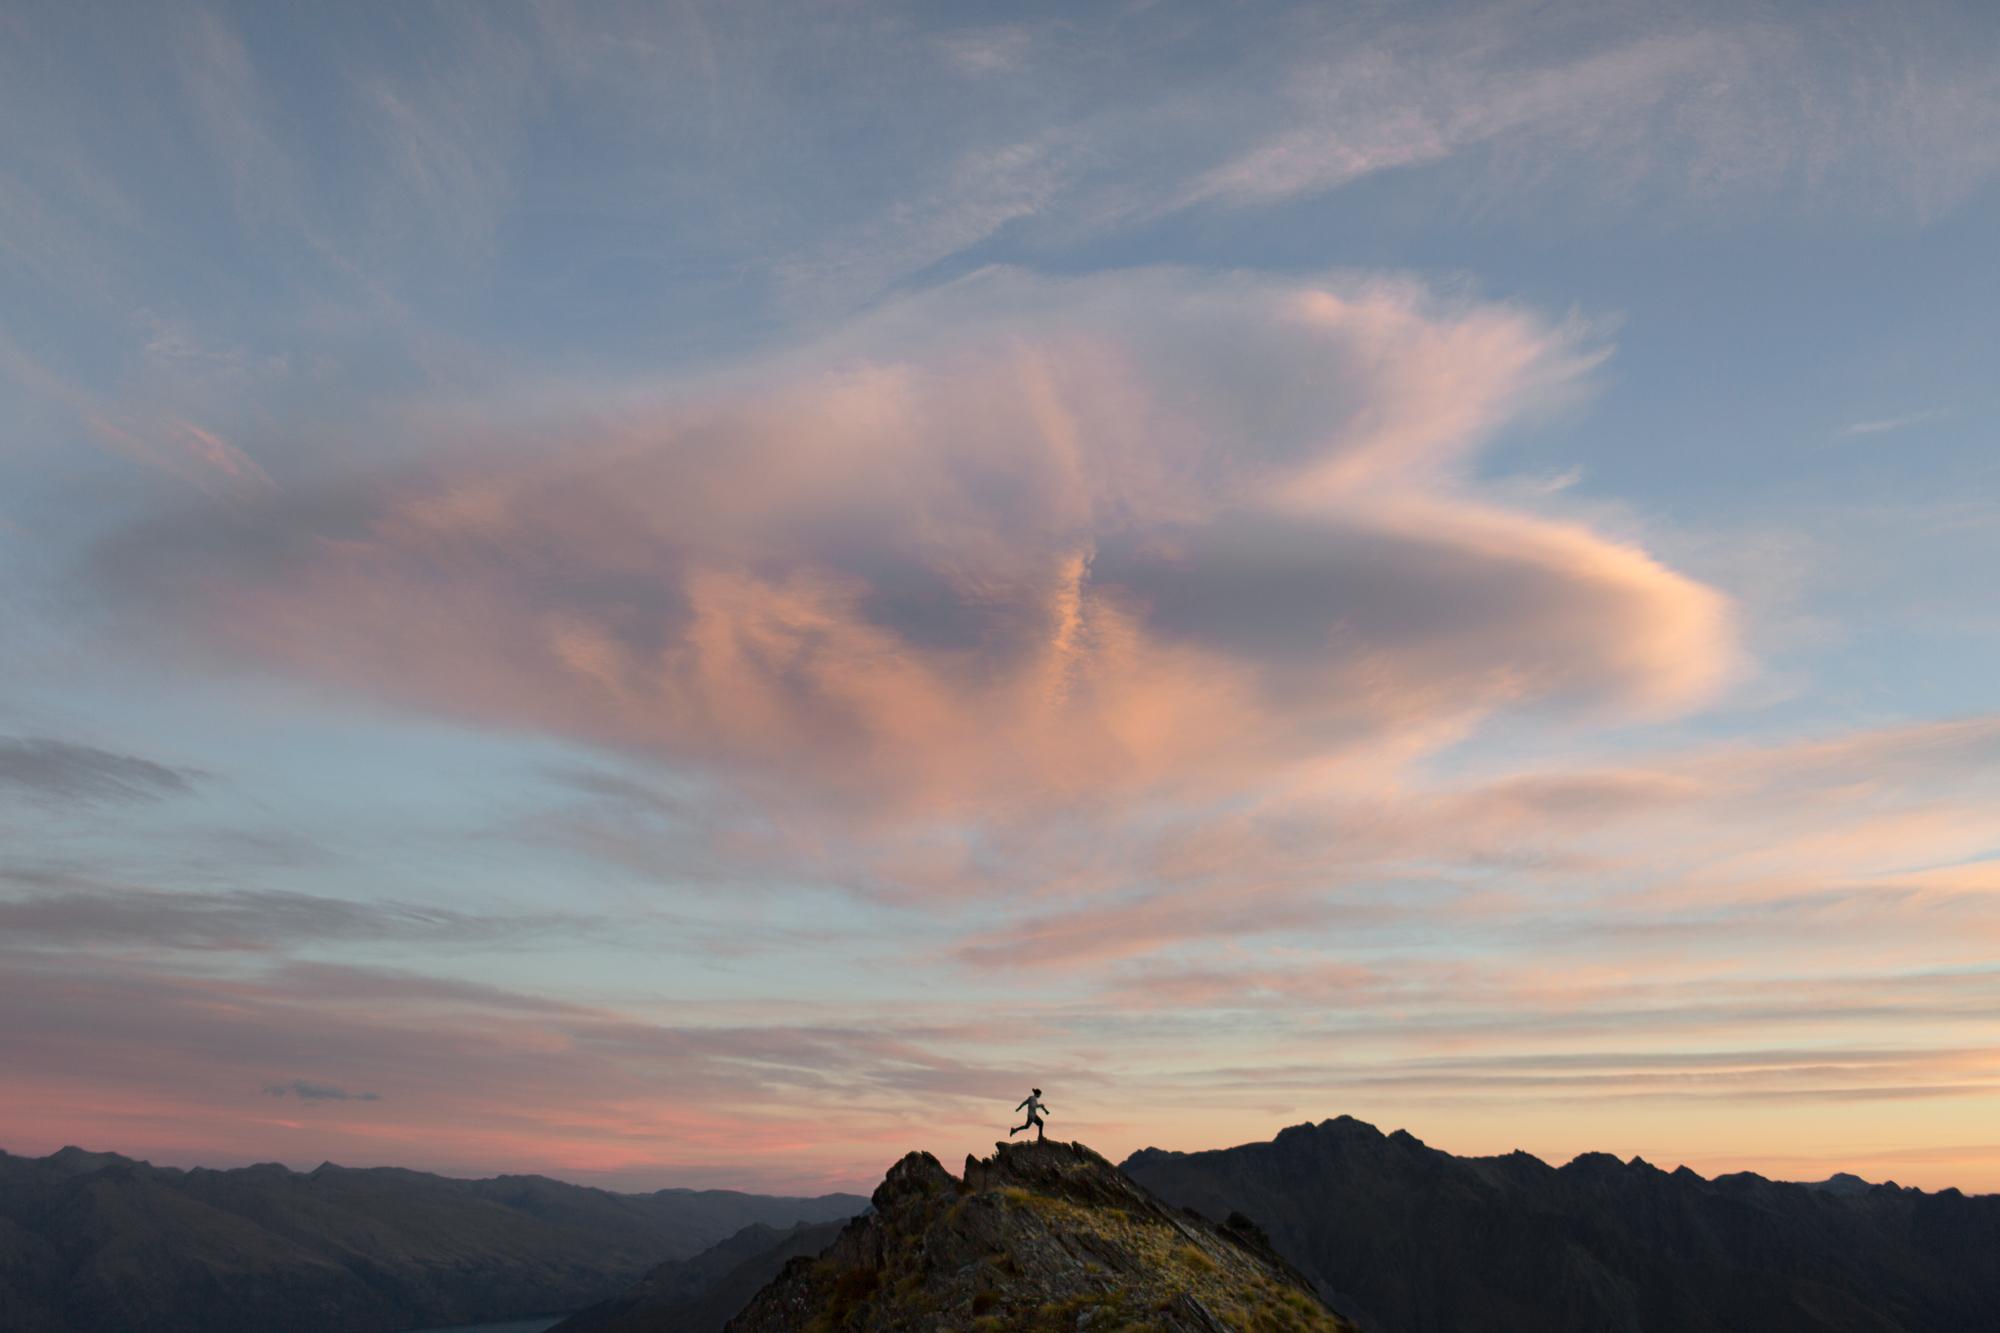 18-Bec_Kilpatrick_Photography_New_ZealandBEC_0925